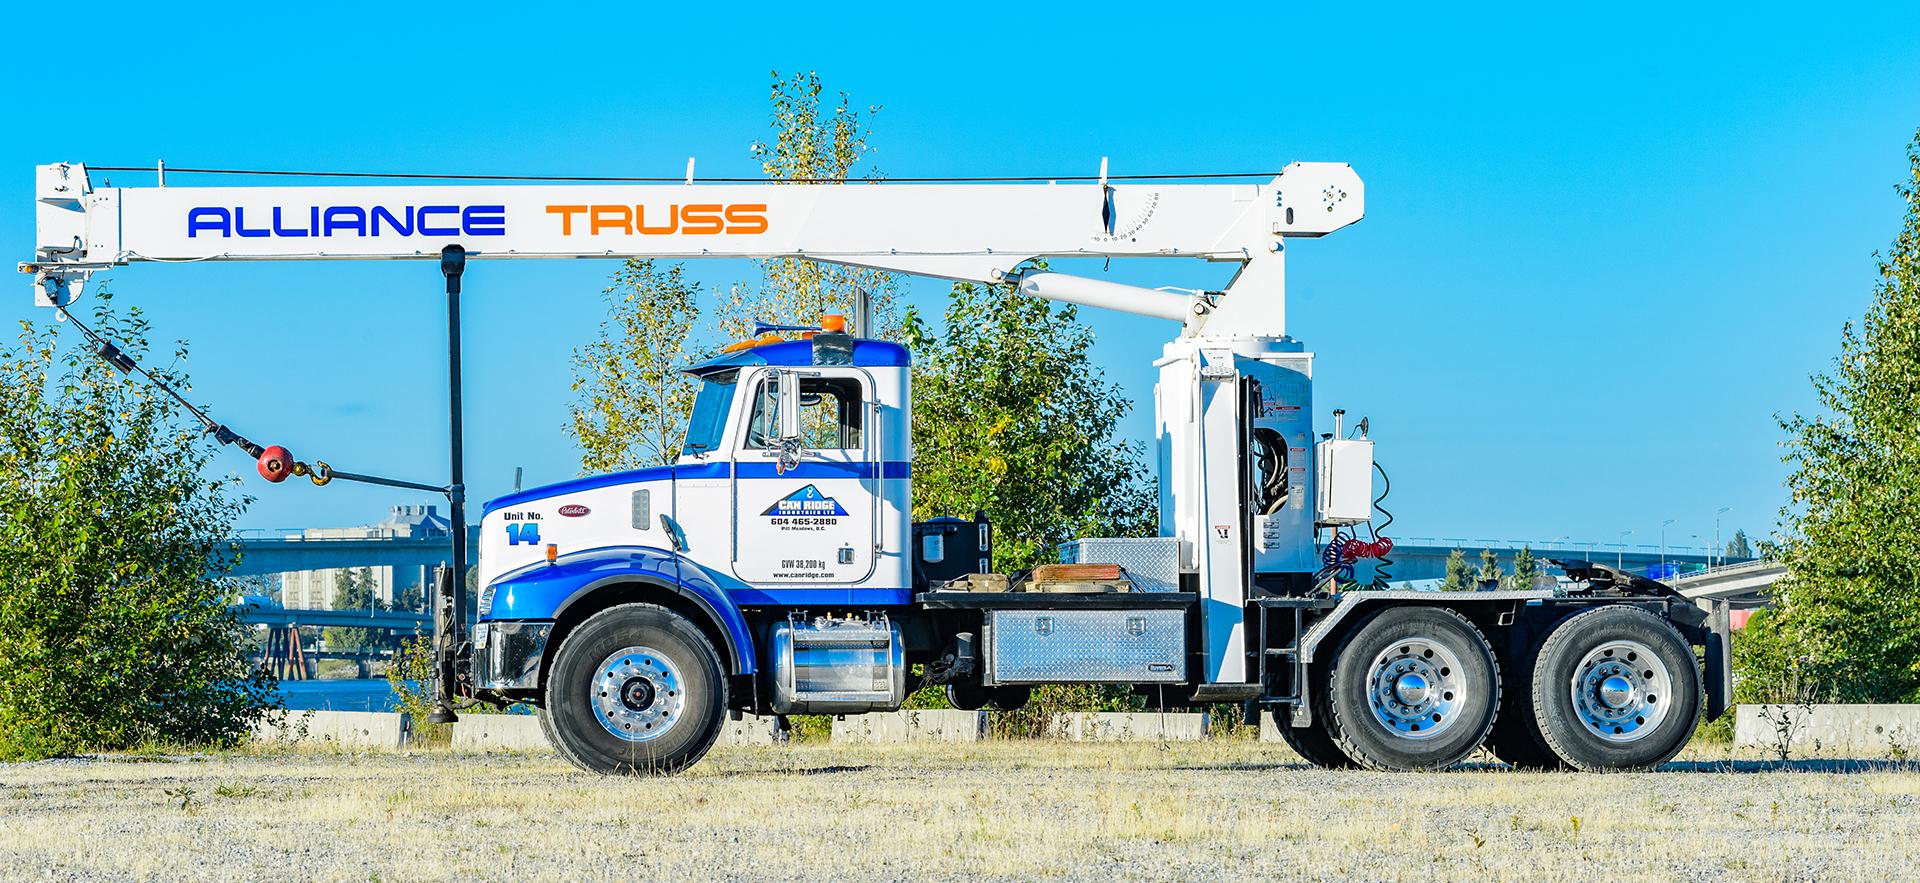 Concrete Retaining Walls, Blocks & Barriers | Train & Transportation Company | Can Ridge Industries Ltd. Unit 14 Marketing Photo